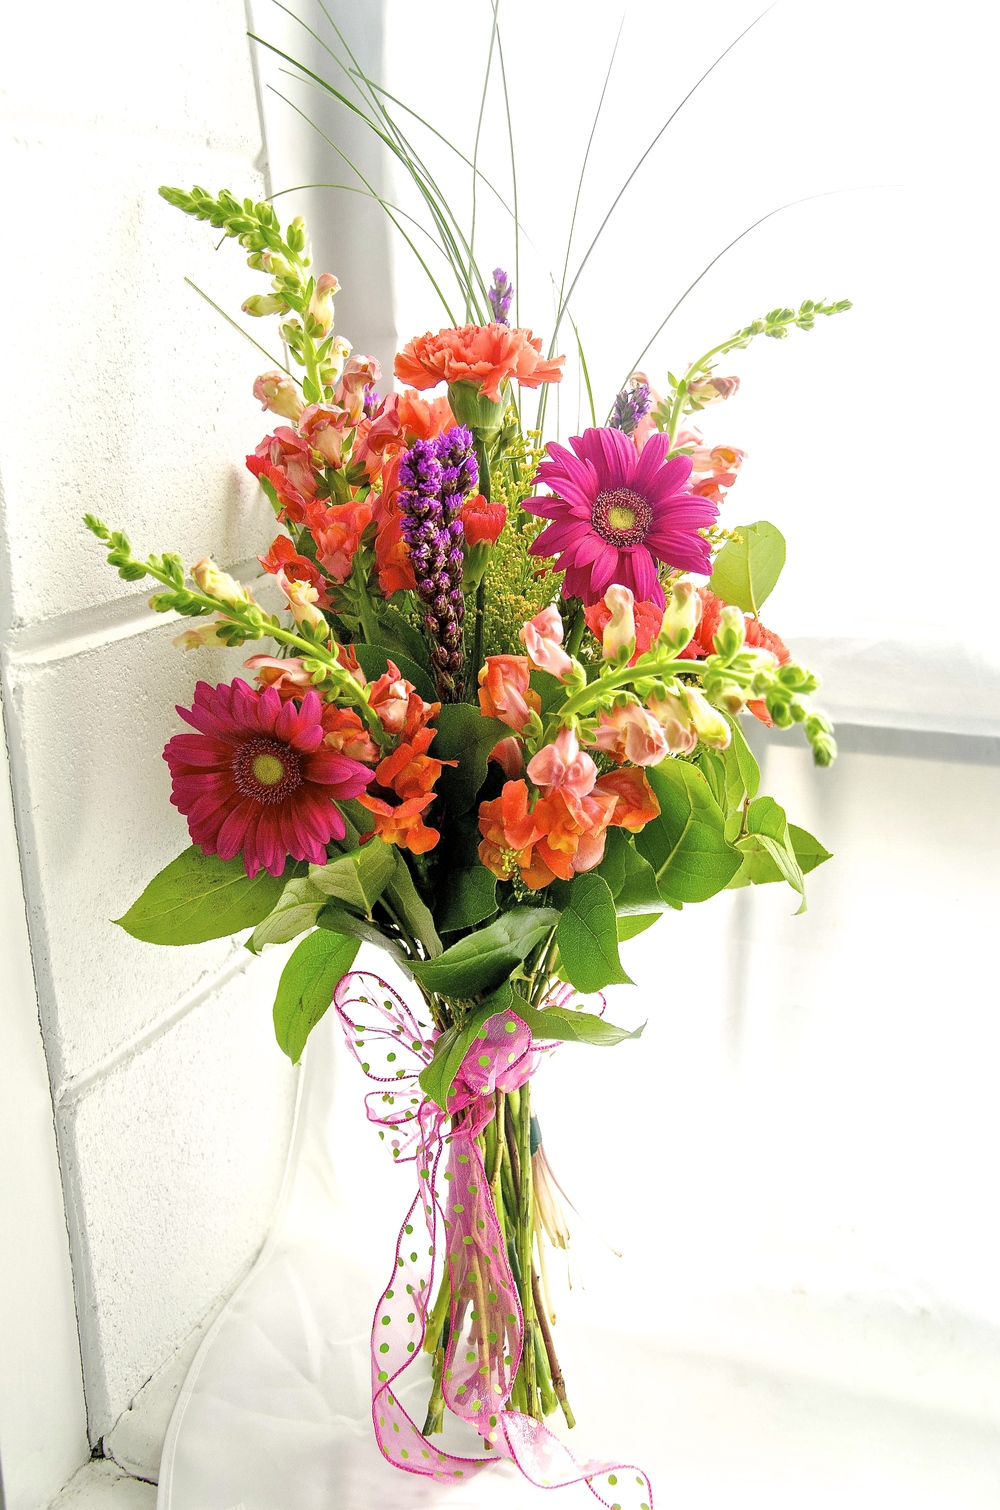 TST_Florals_Handtie_Ardith_photo.jpeg